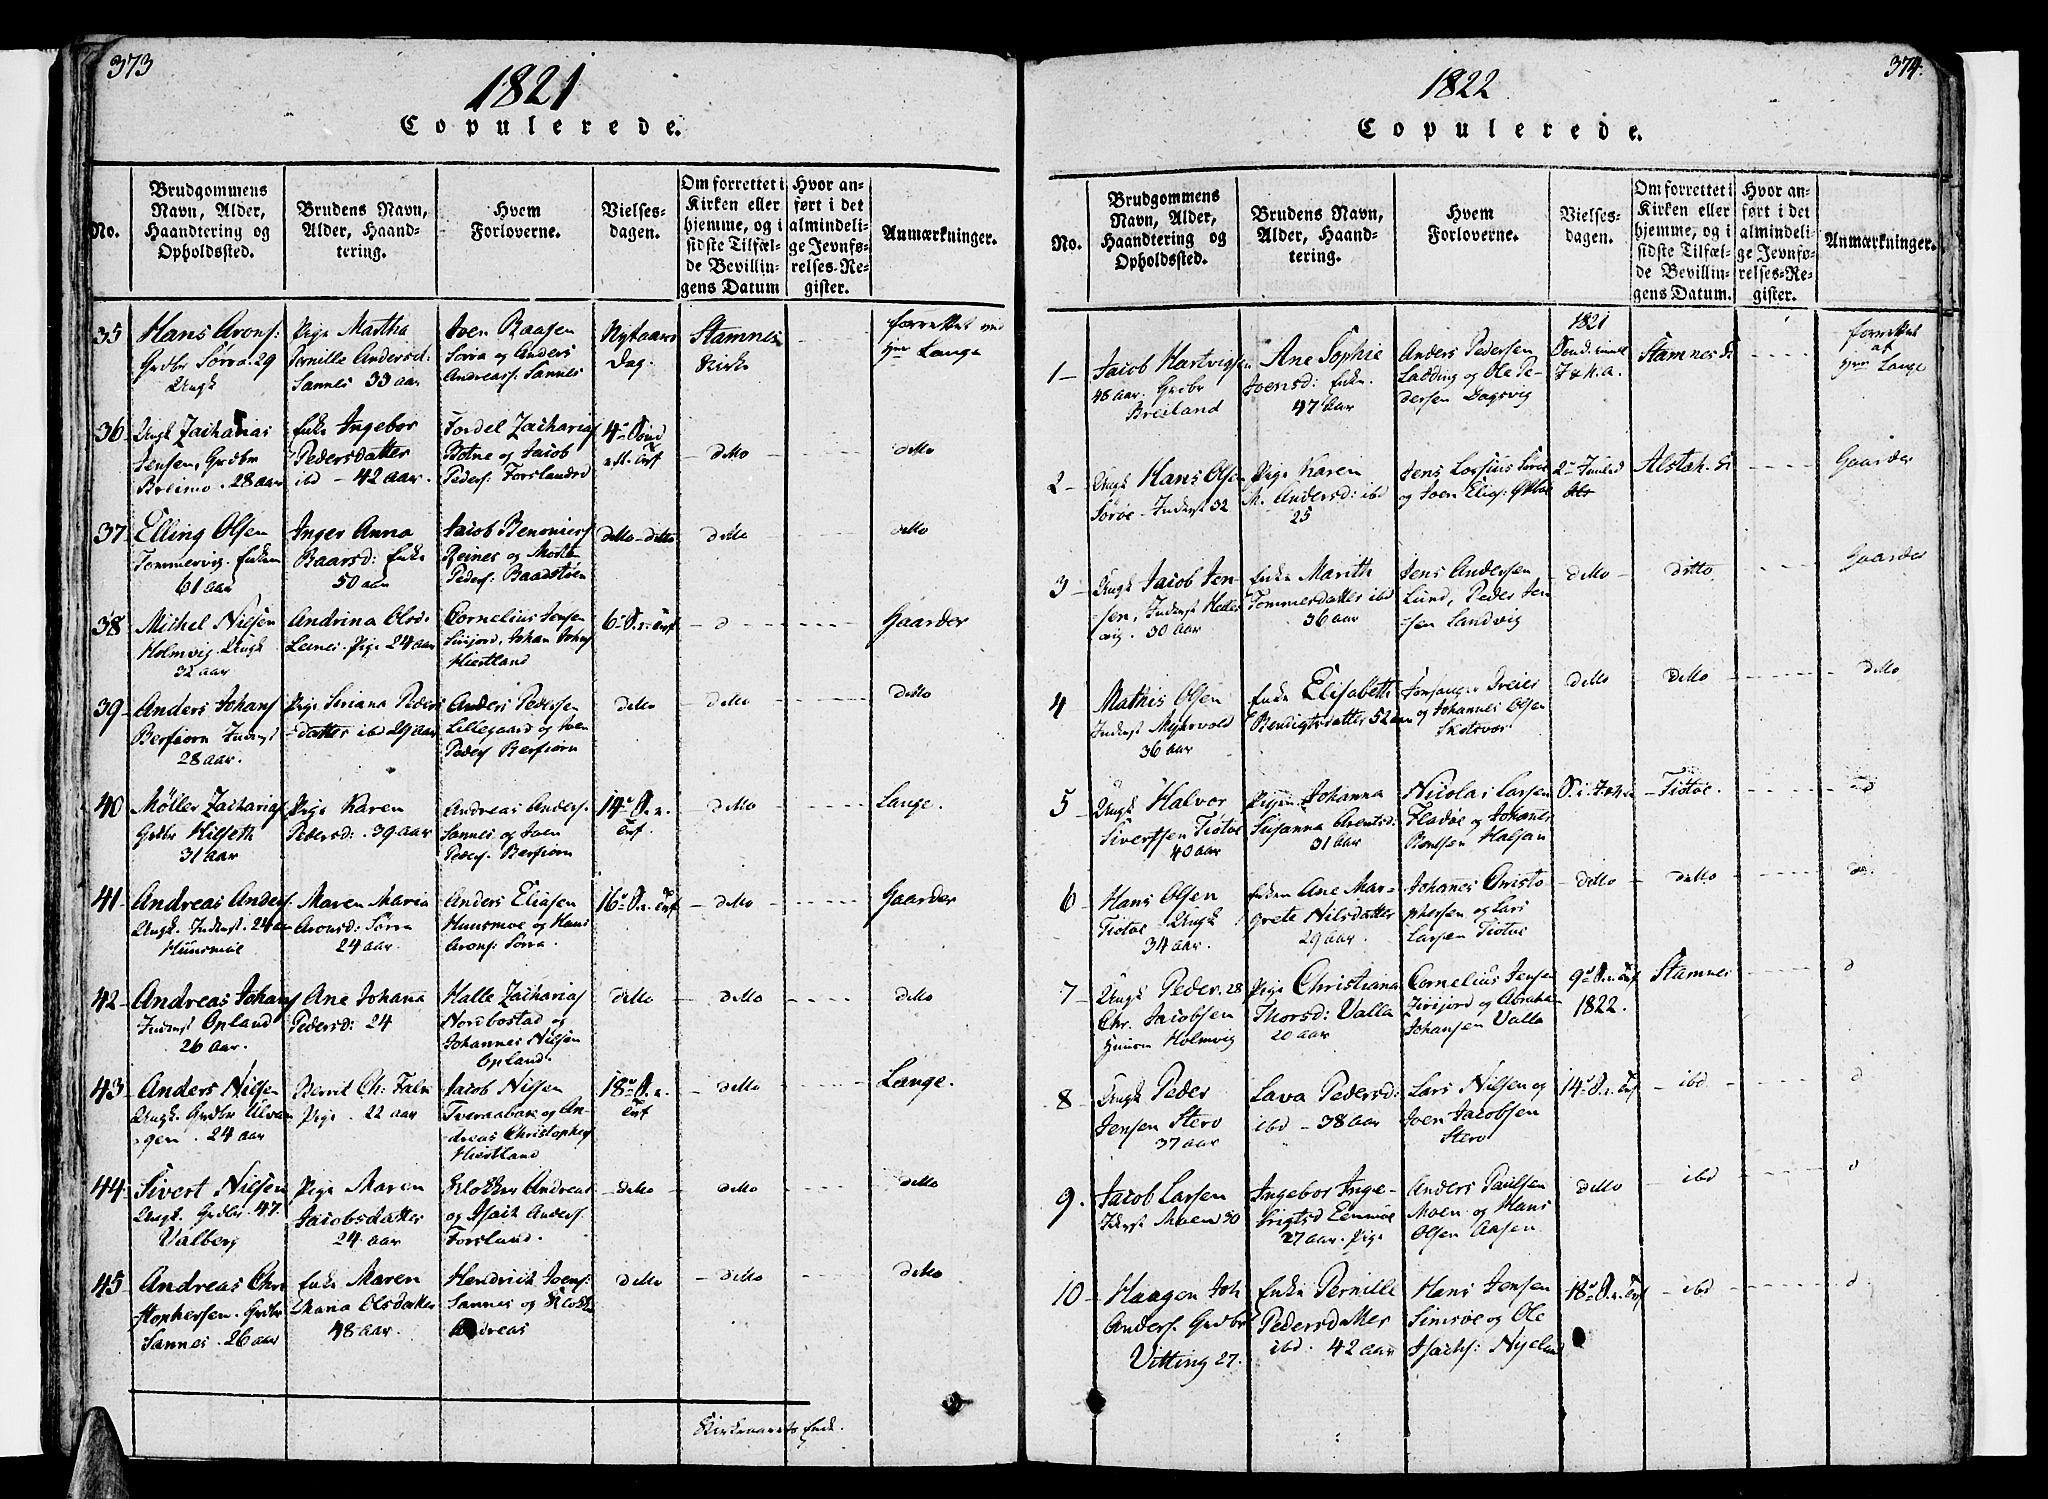 SAT, Ministerialprotokoller, klokkerbøker og fødselsregistre - Nordland, 830/L0445: Ministerialbok nr. 830A09, 1820-1830, s. 373-374